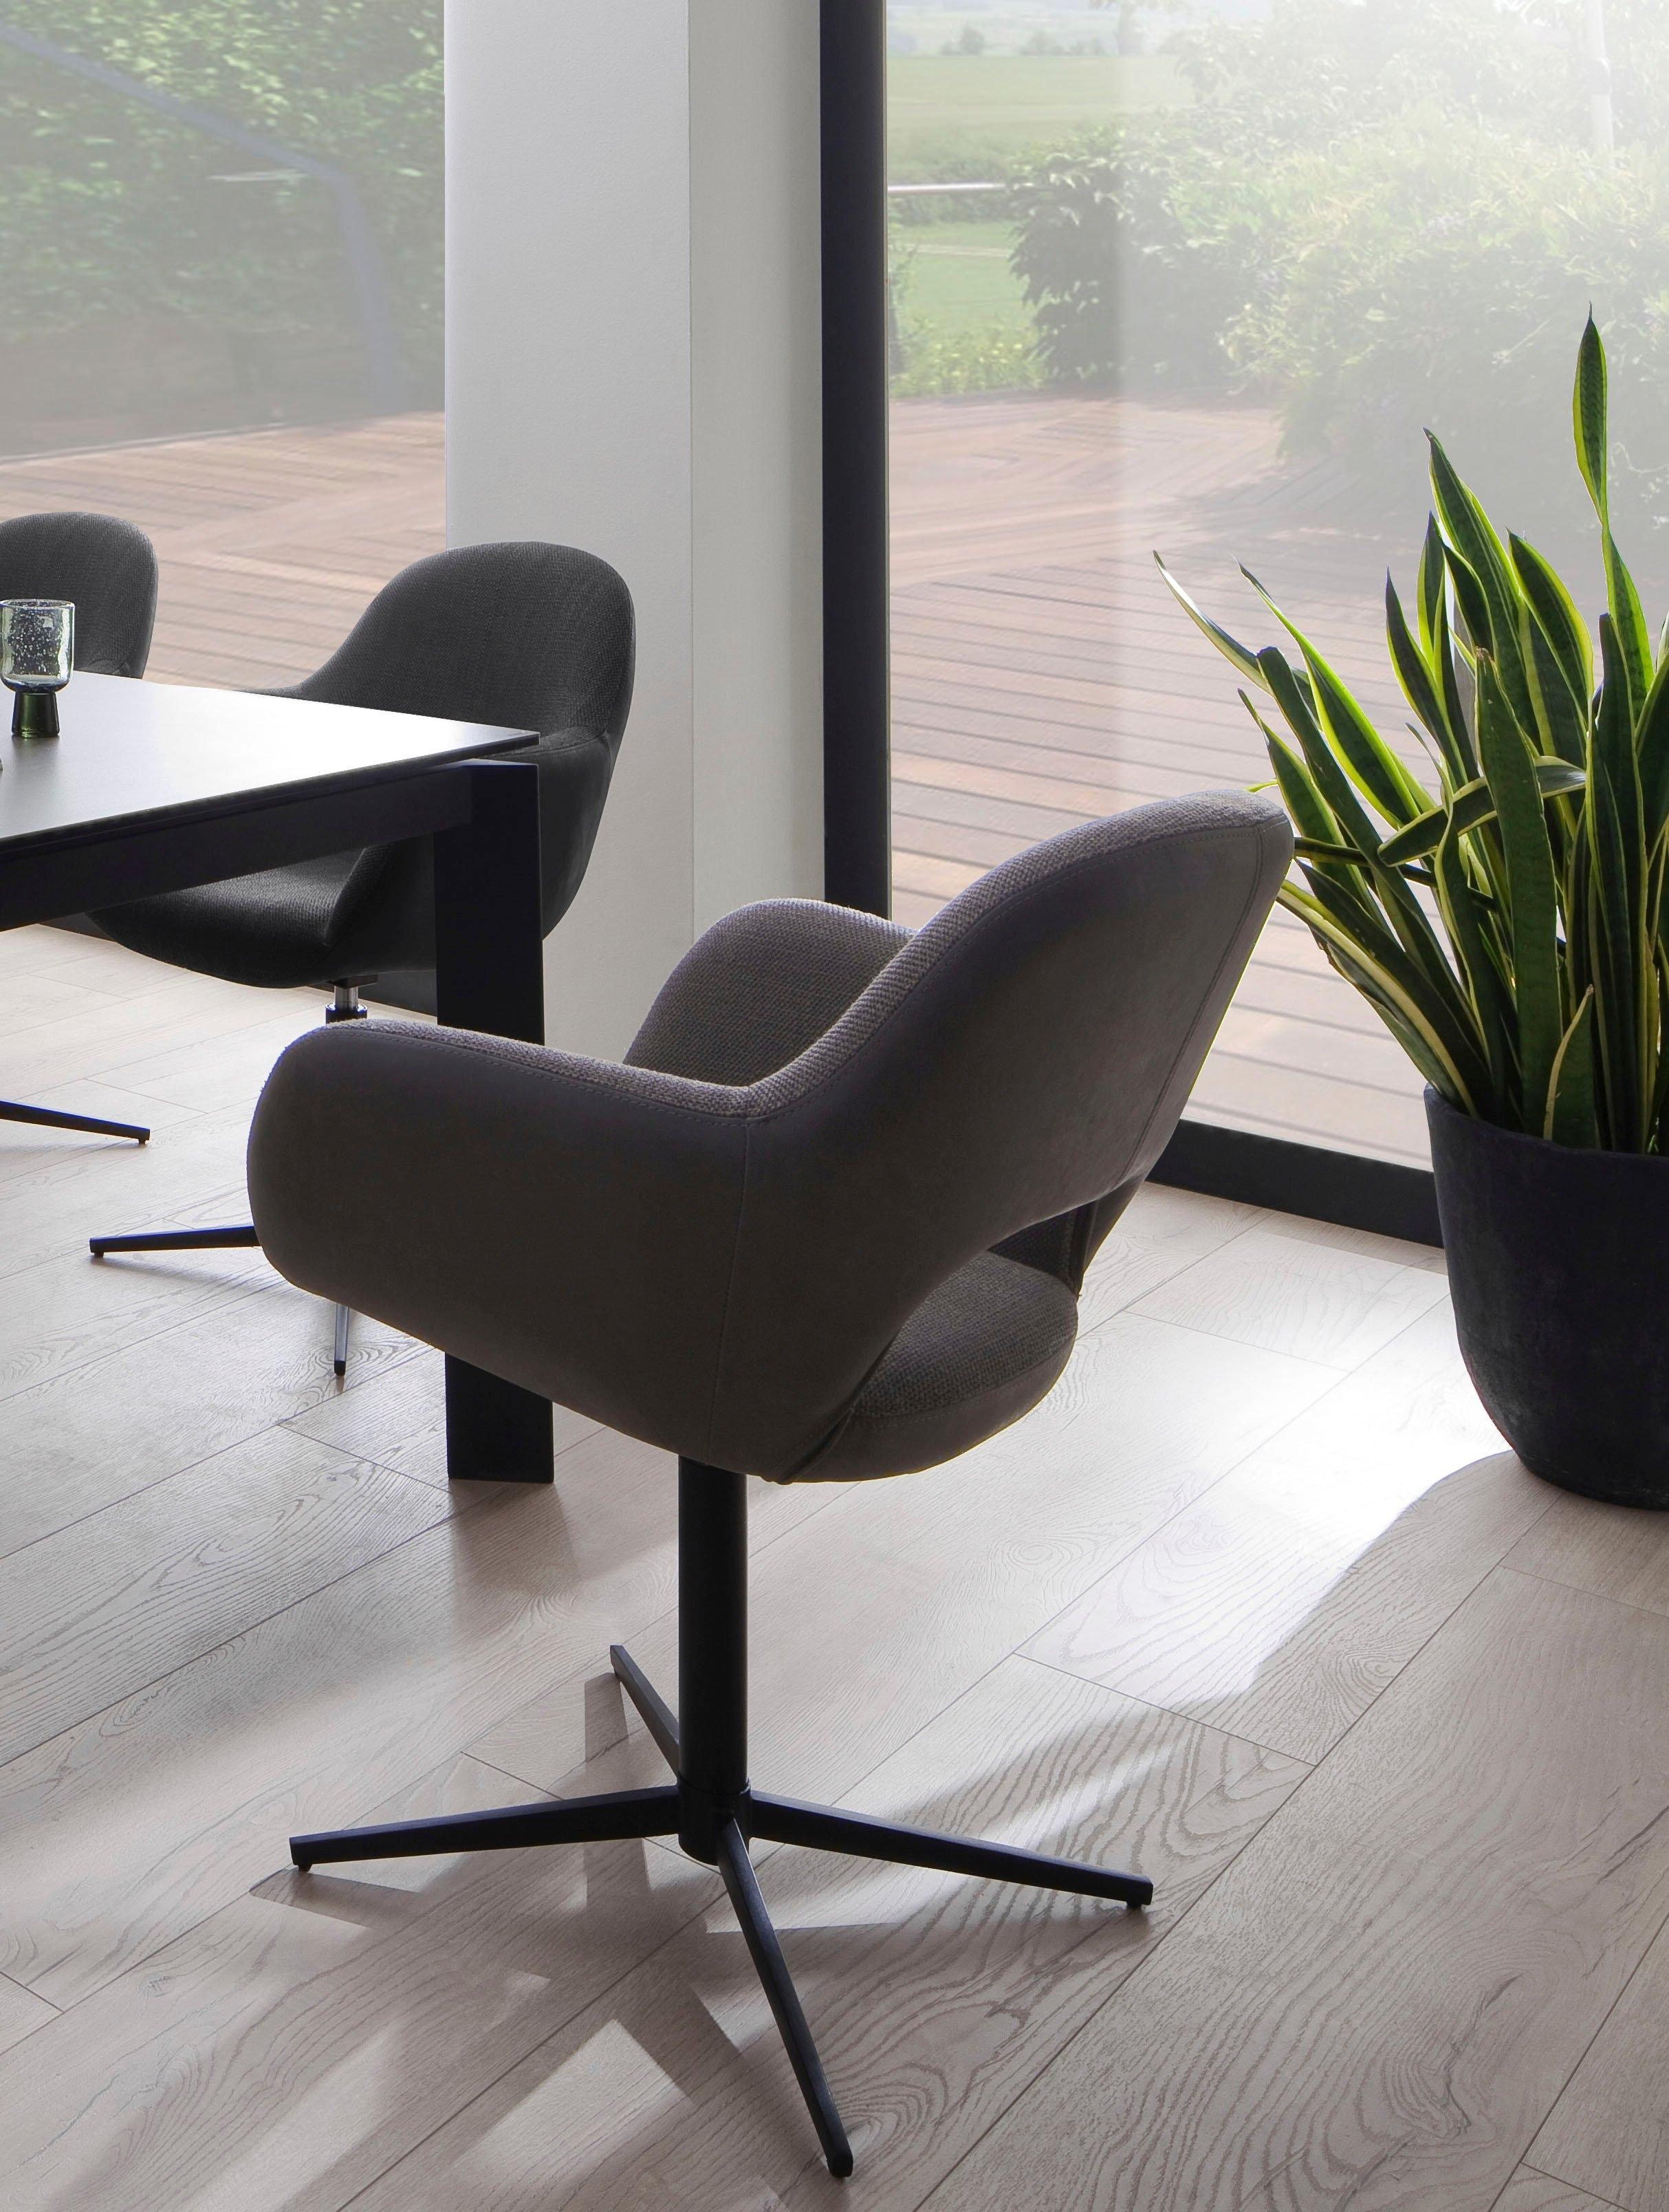 MCA furniture Eetkamerstoel MELROSE Stoel 360º draaibaar met nivellering (set, 2 stuks) - verschillende betaalmethodes